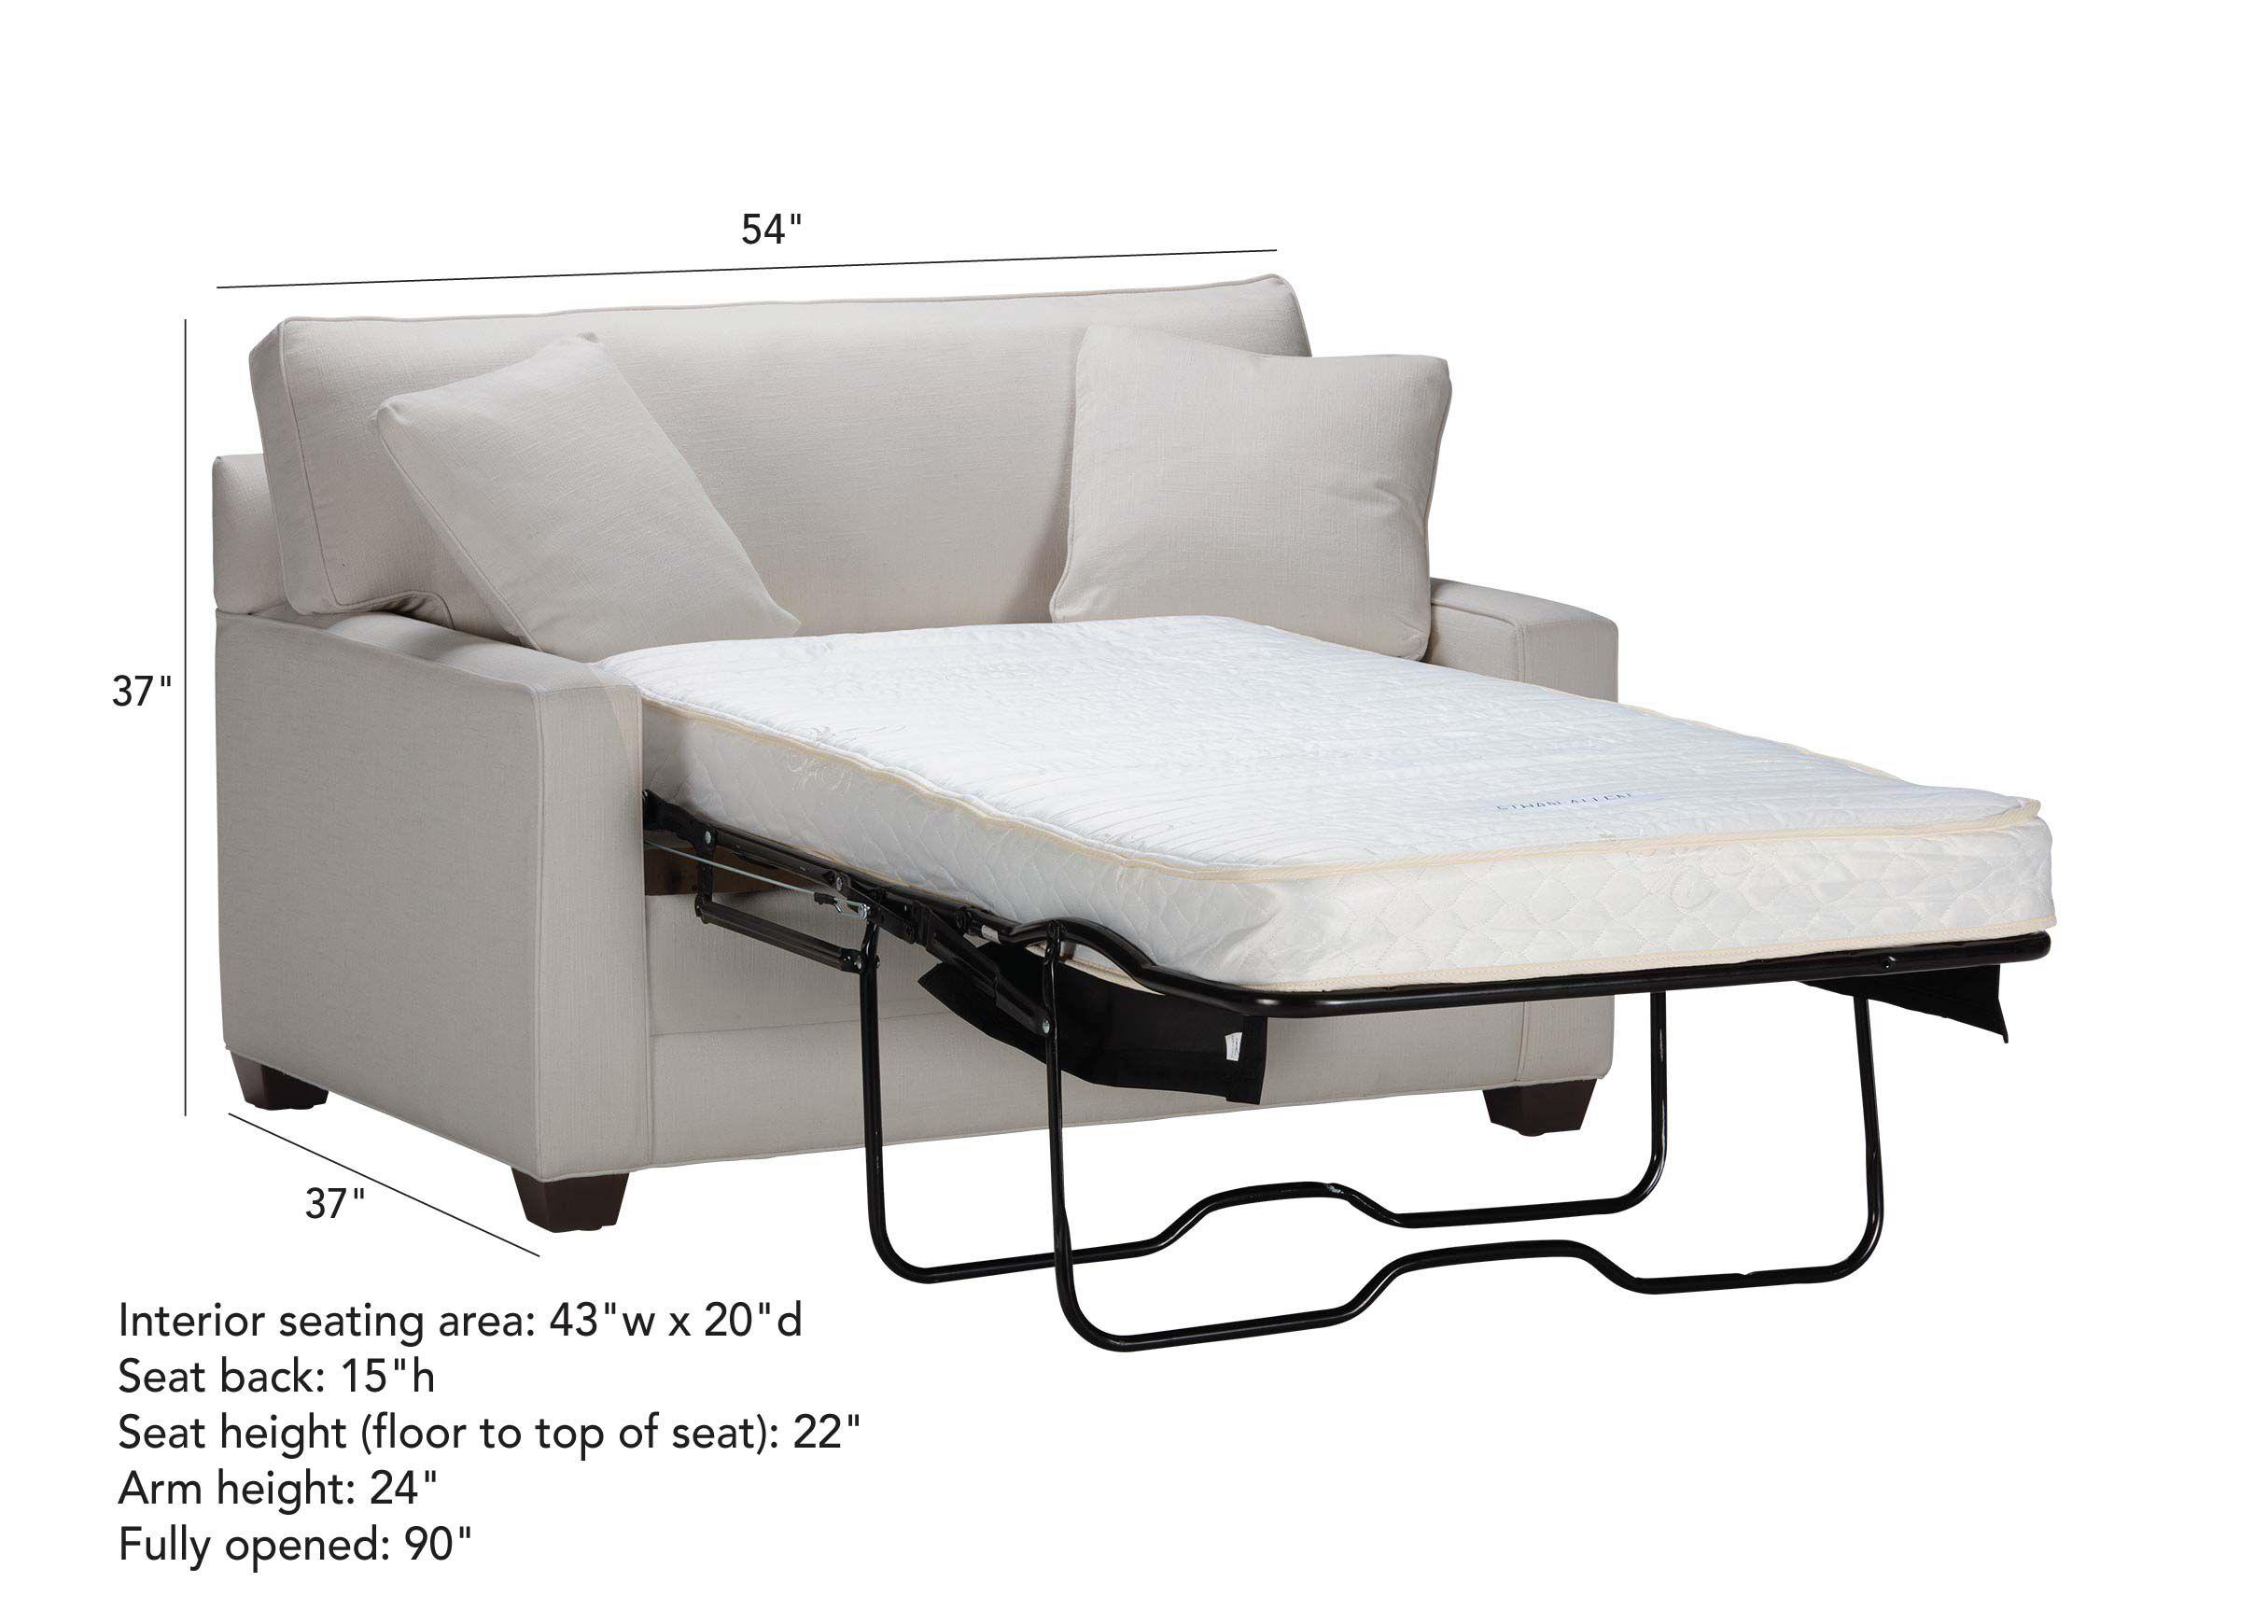 - Bennett Track-Arm Chair-and-a-Half Twin Sleeper Ethan Allen